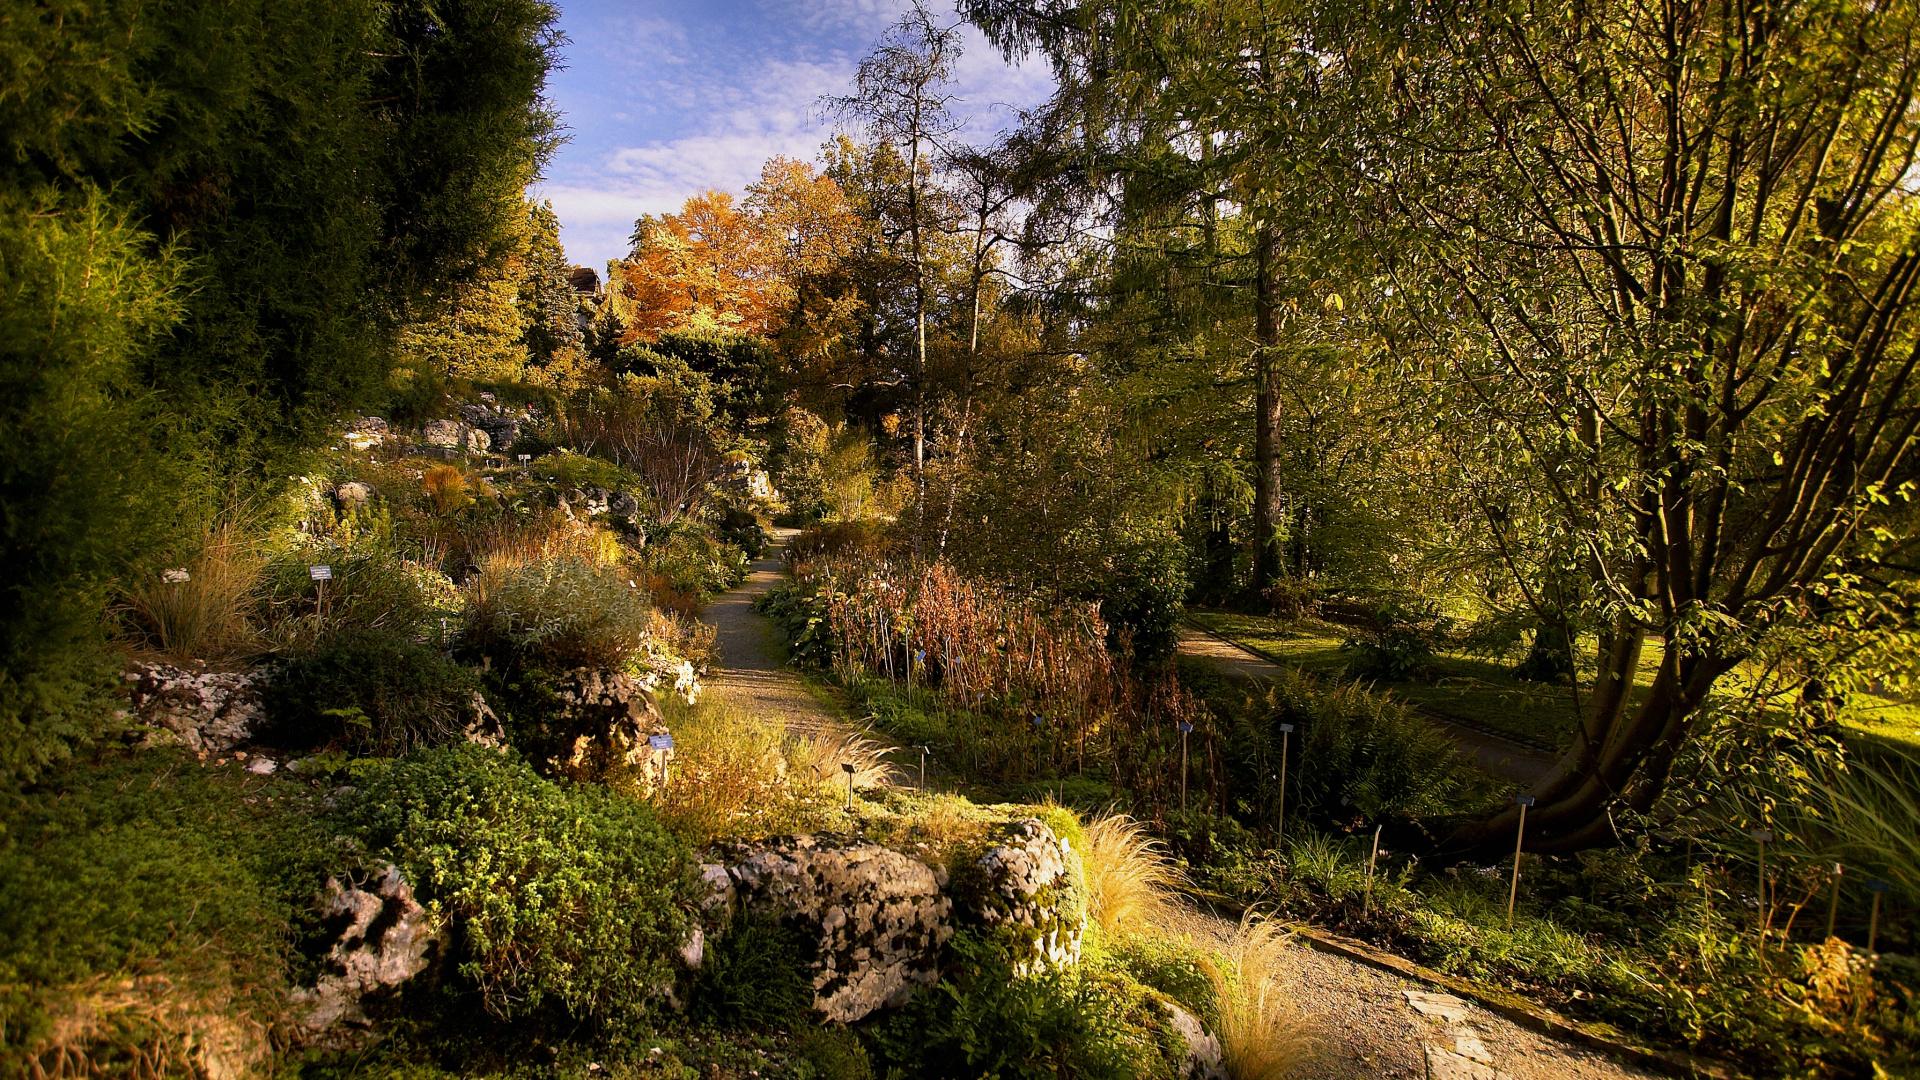 The Botanical Garden of the University of Bern - Bern Welcome